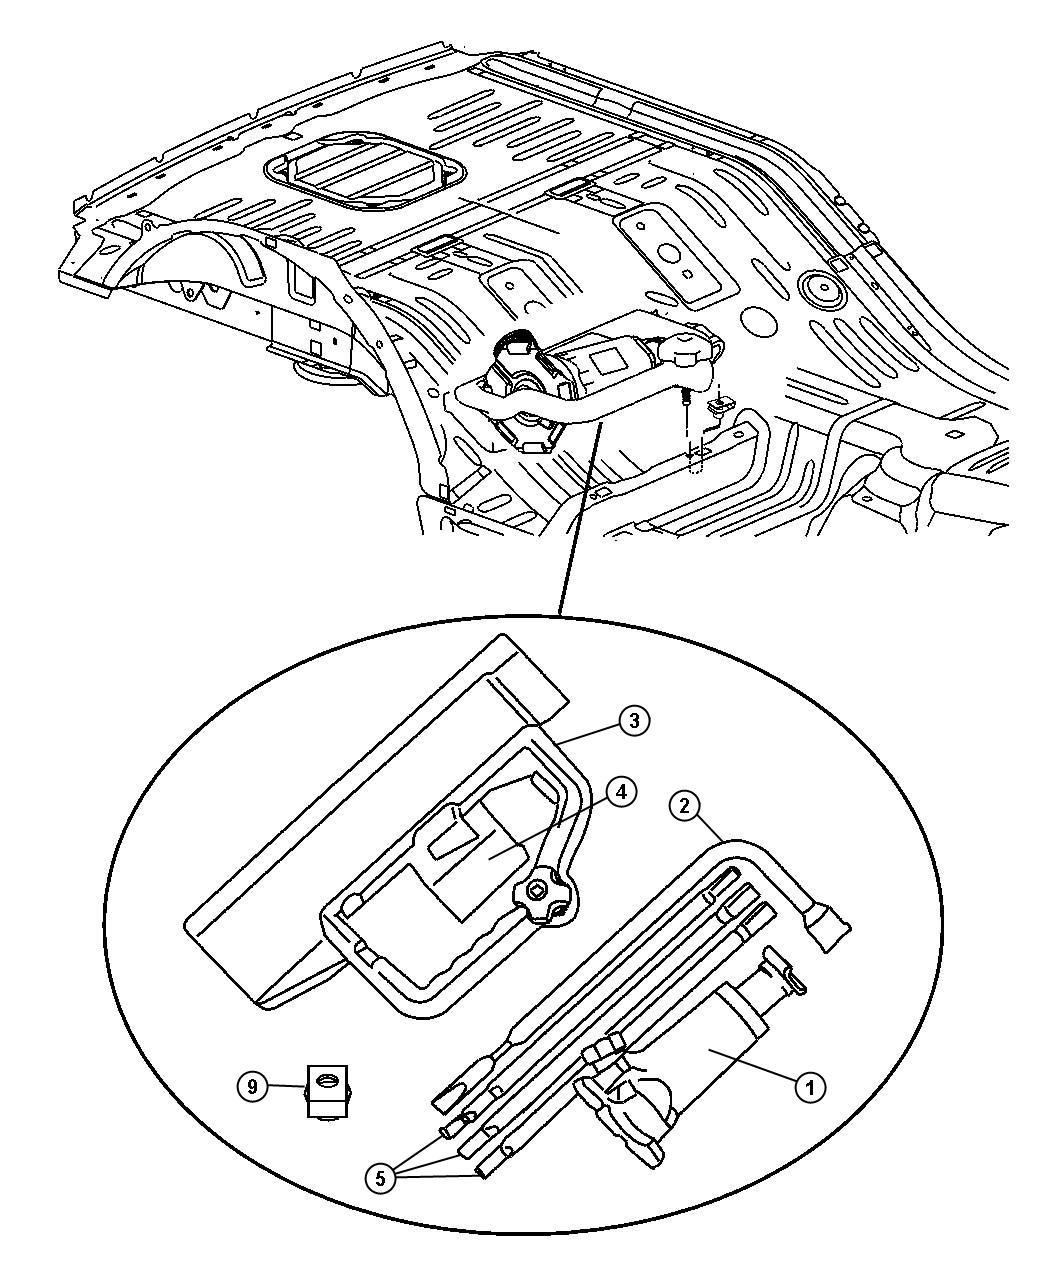 Jeep Grand Cherokee Rear Bumper Parts Diagram Html